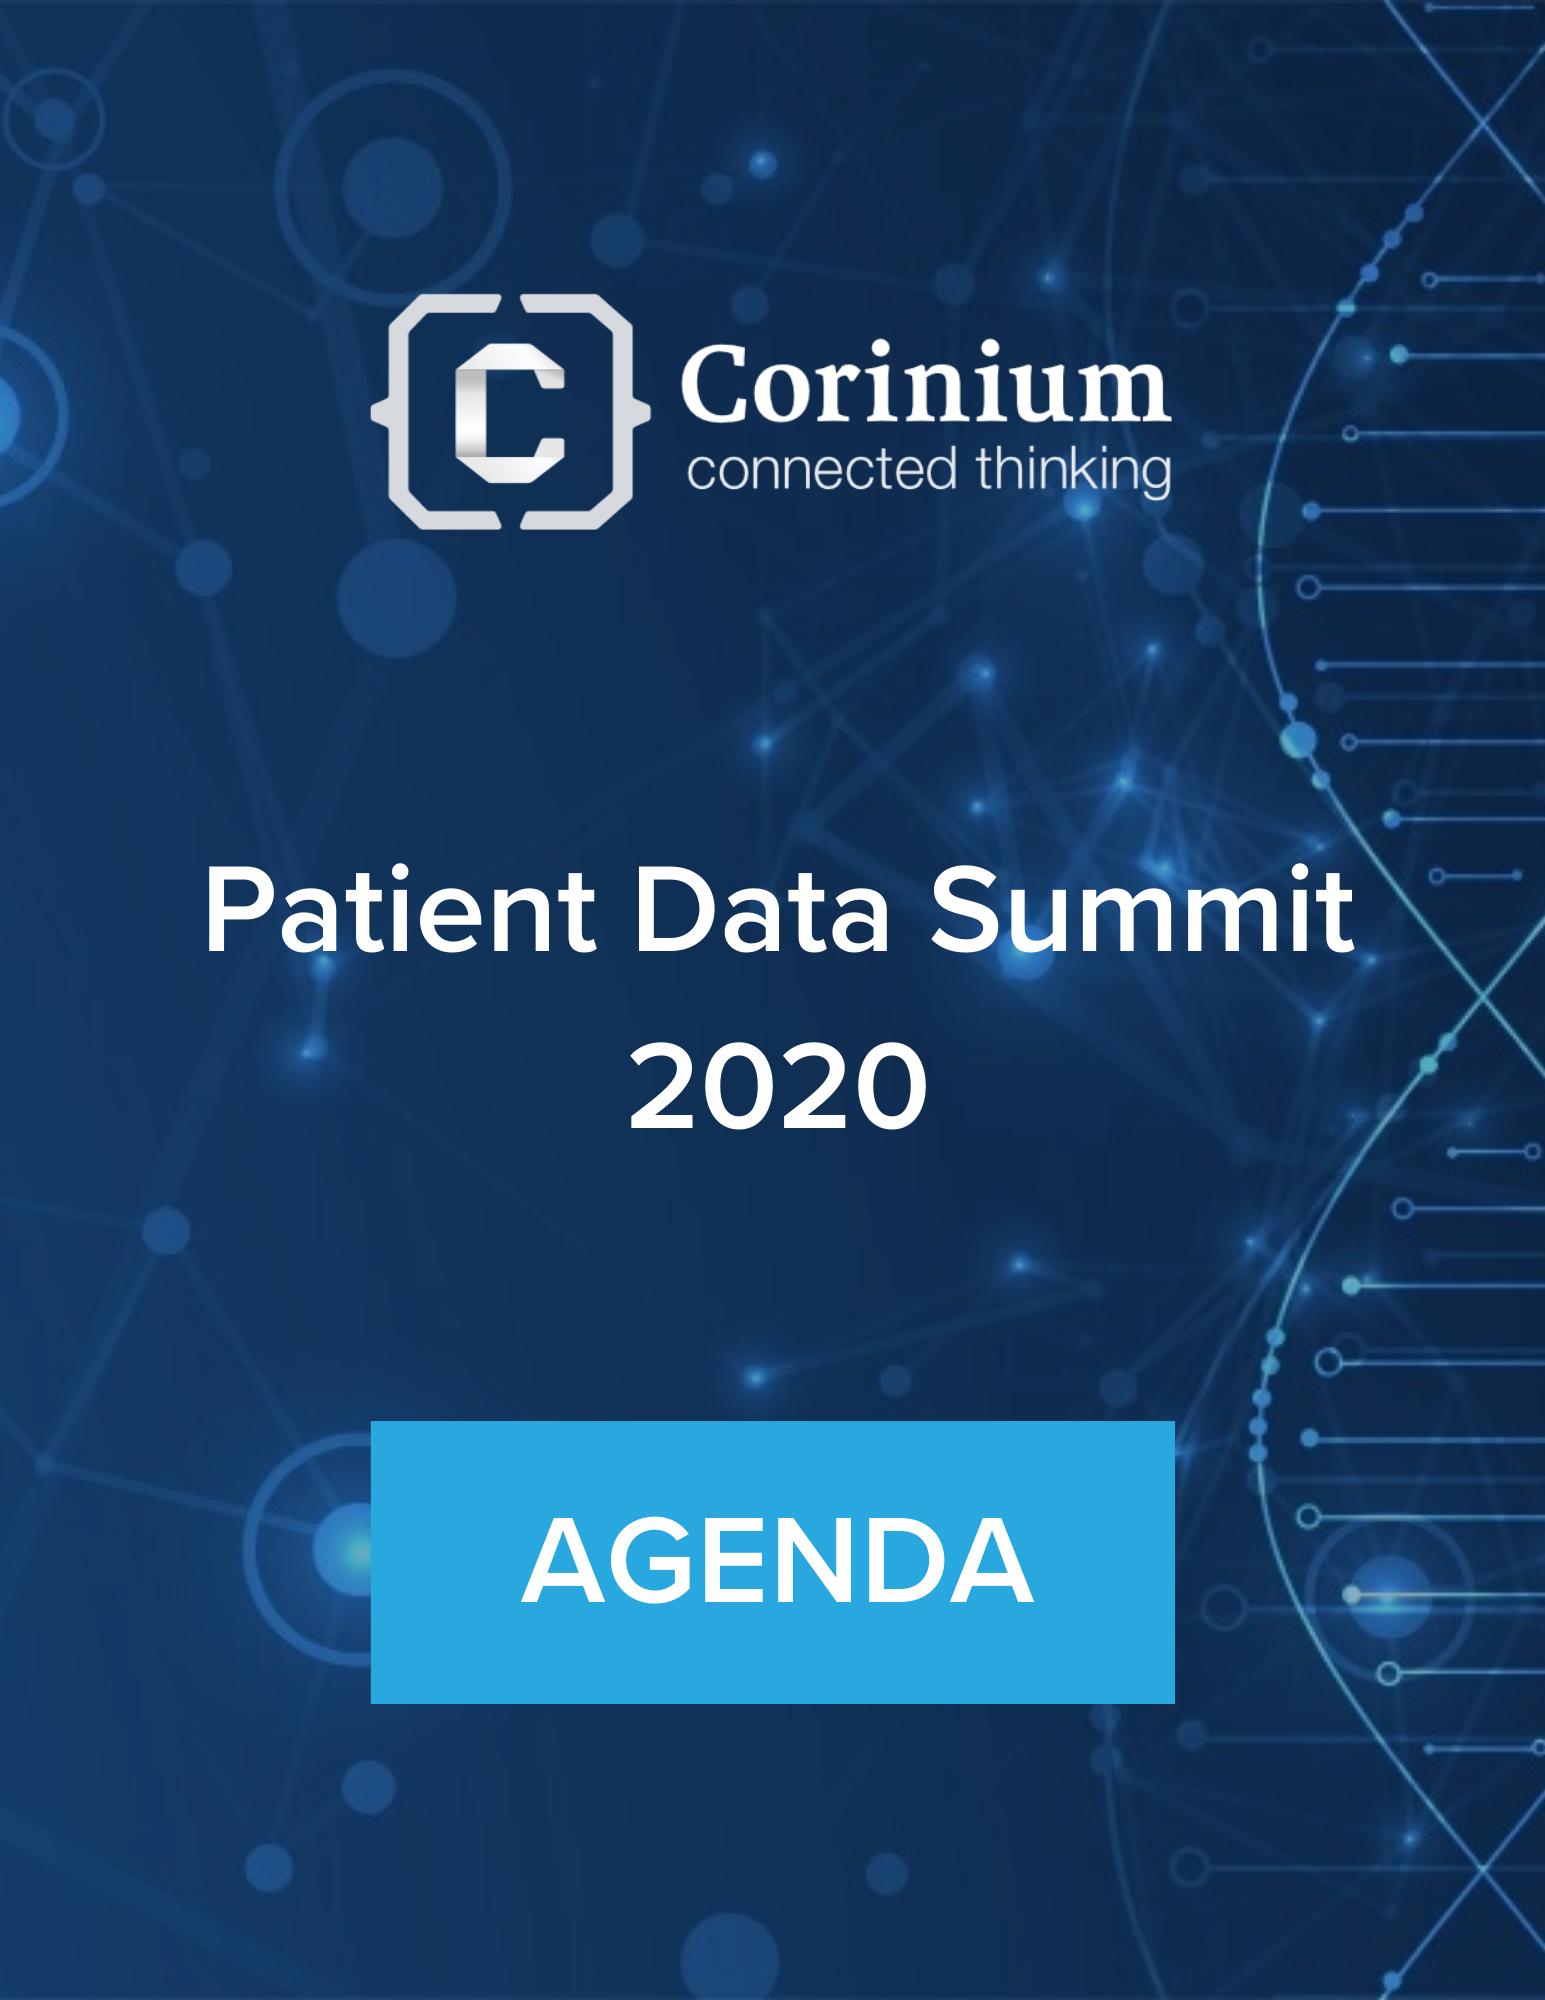 Patient Data Summit - Agenda